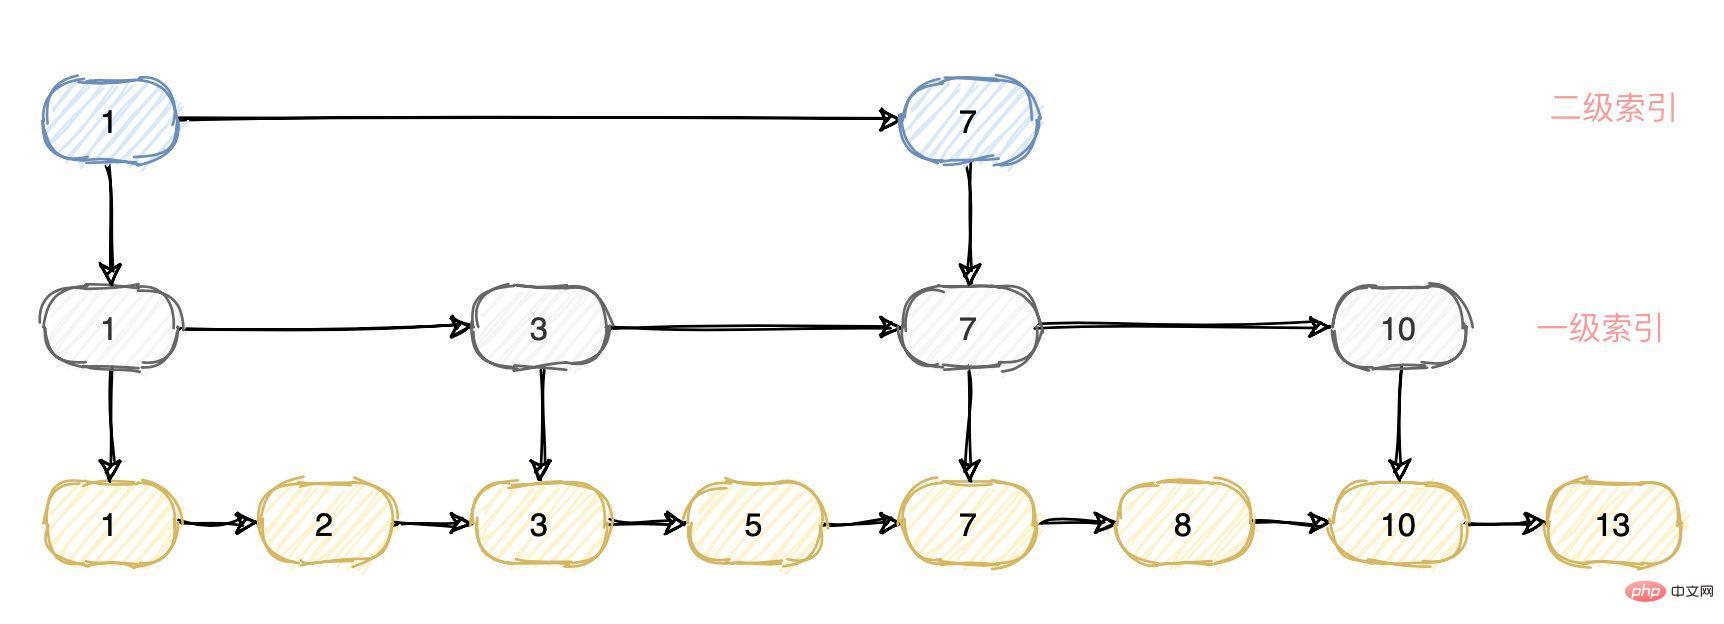 MySQL索引 VS ElasticSearch索引_亿码酷站_编程开发技术教程插图7